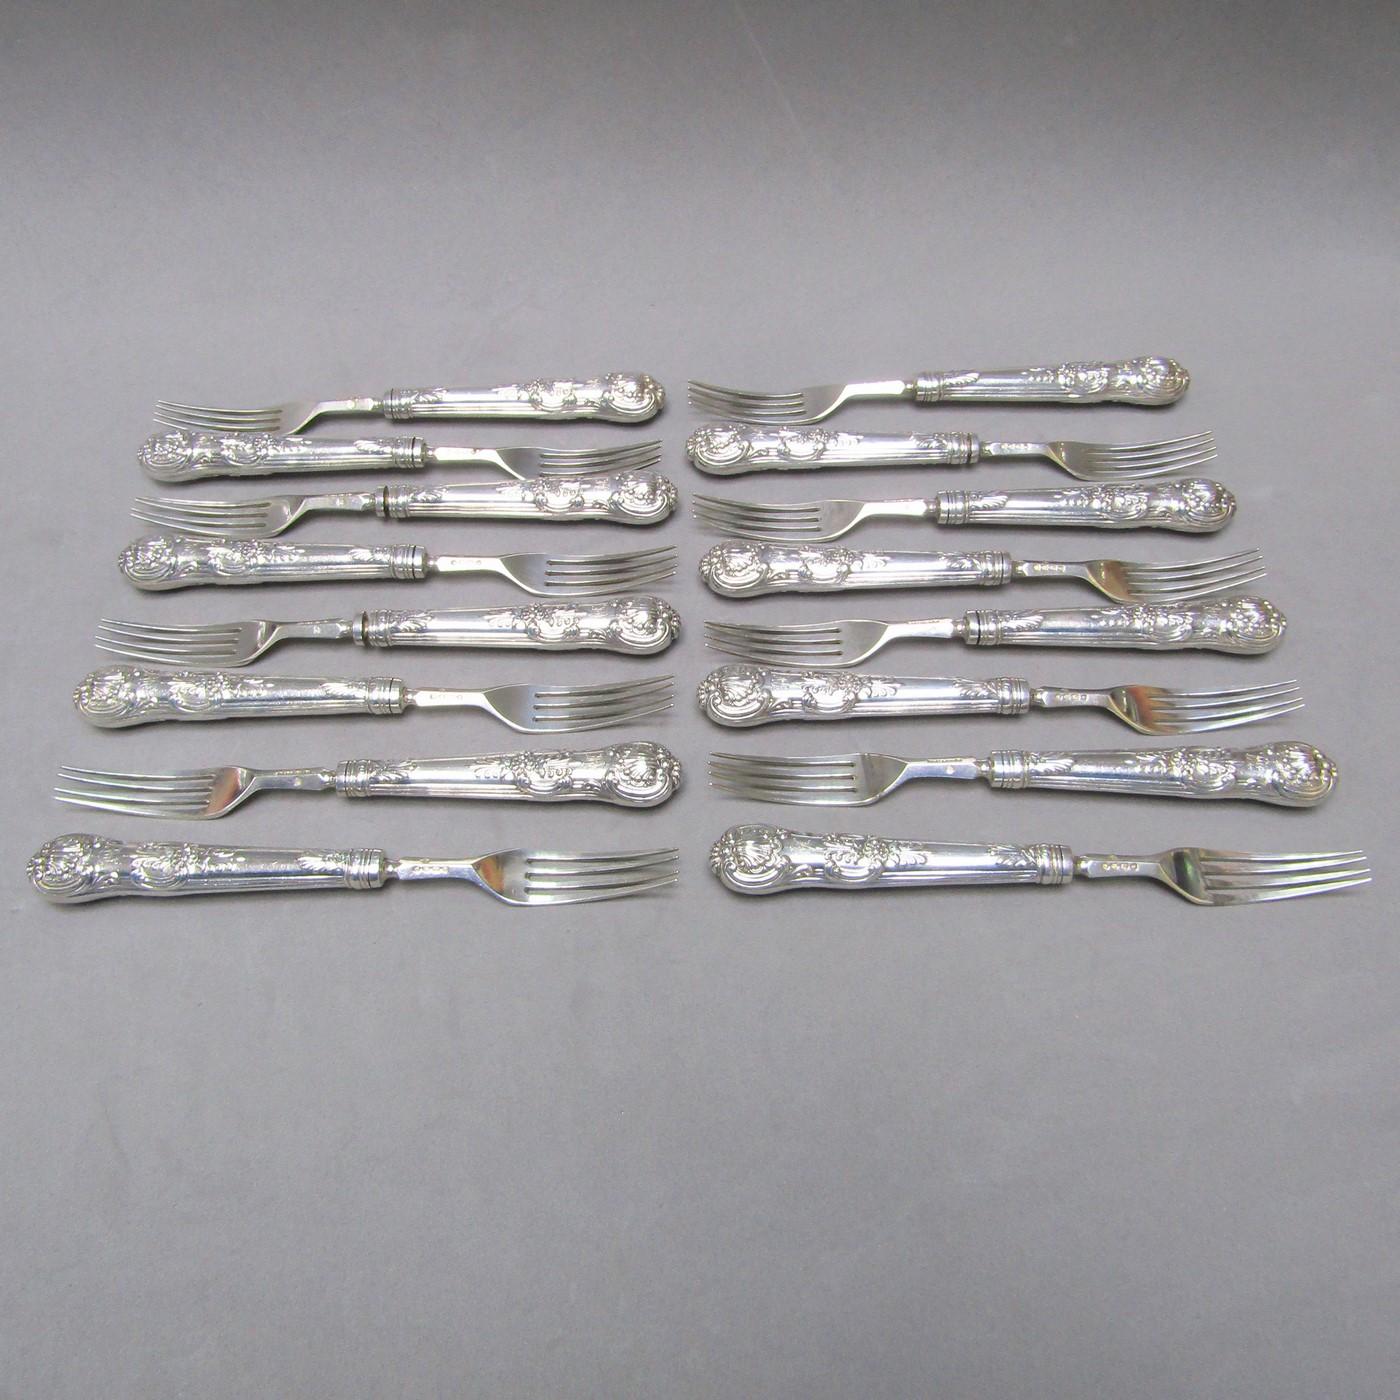 F.H. Lote de 16 tenedores para ensalada en Plata Inglesa. Londres, 1888.